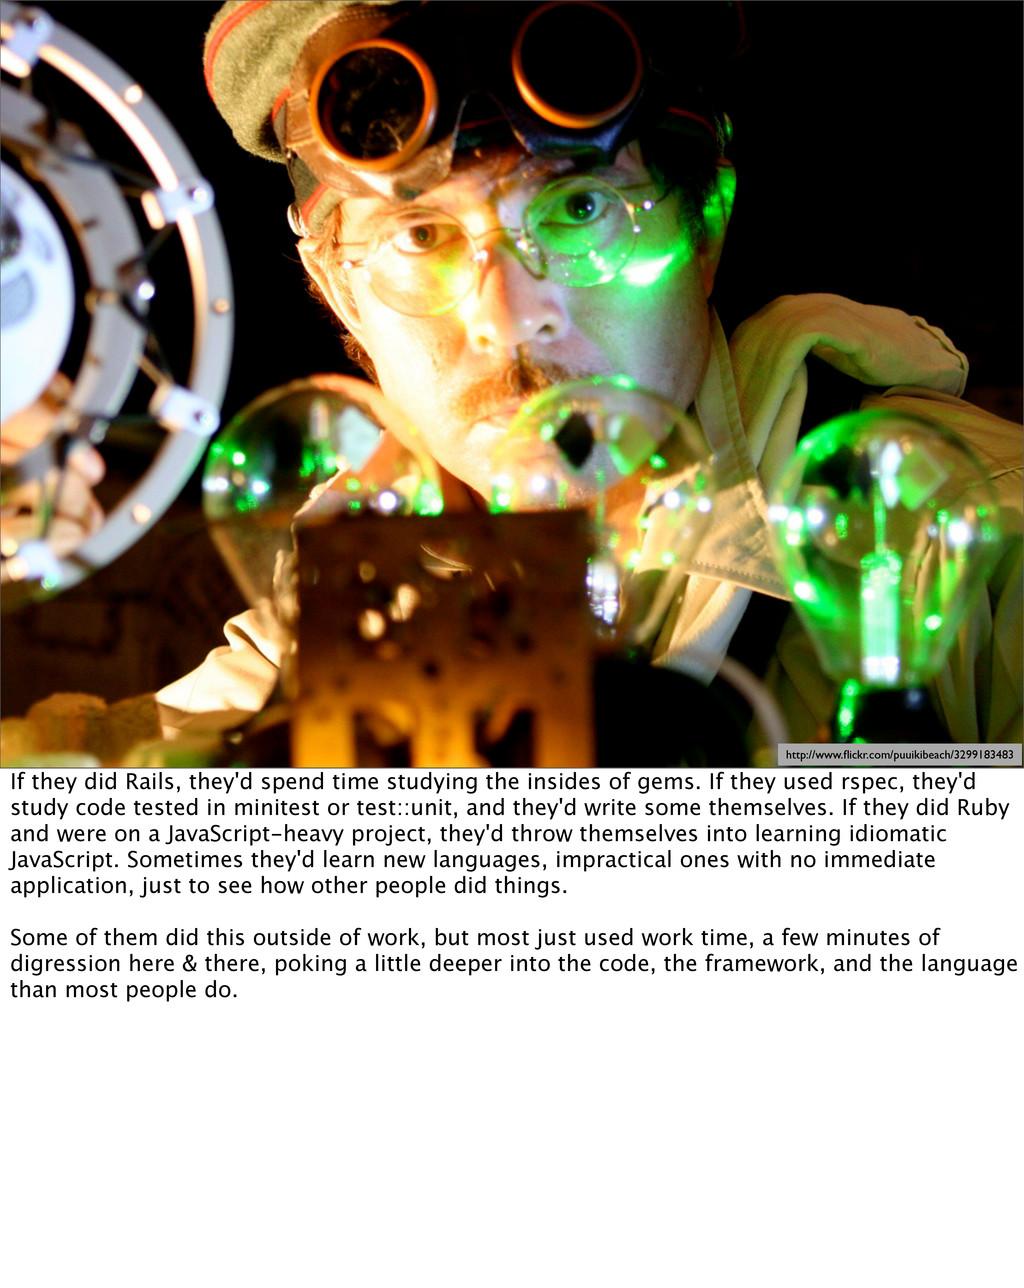 of experimentation http://www.flickr.com/puuikib...